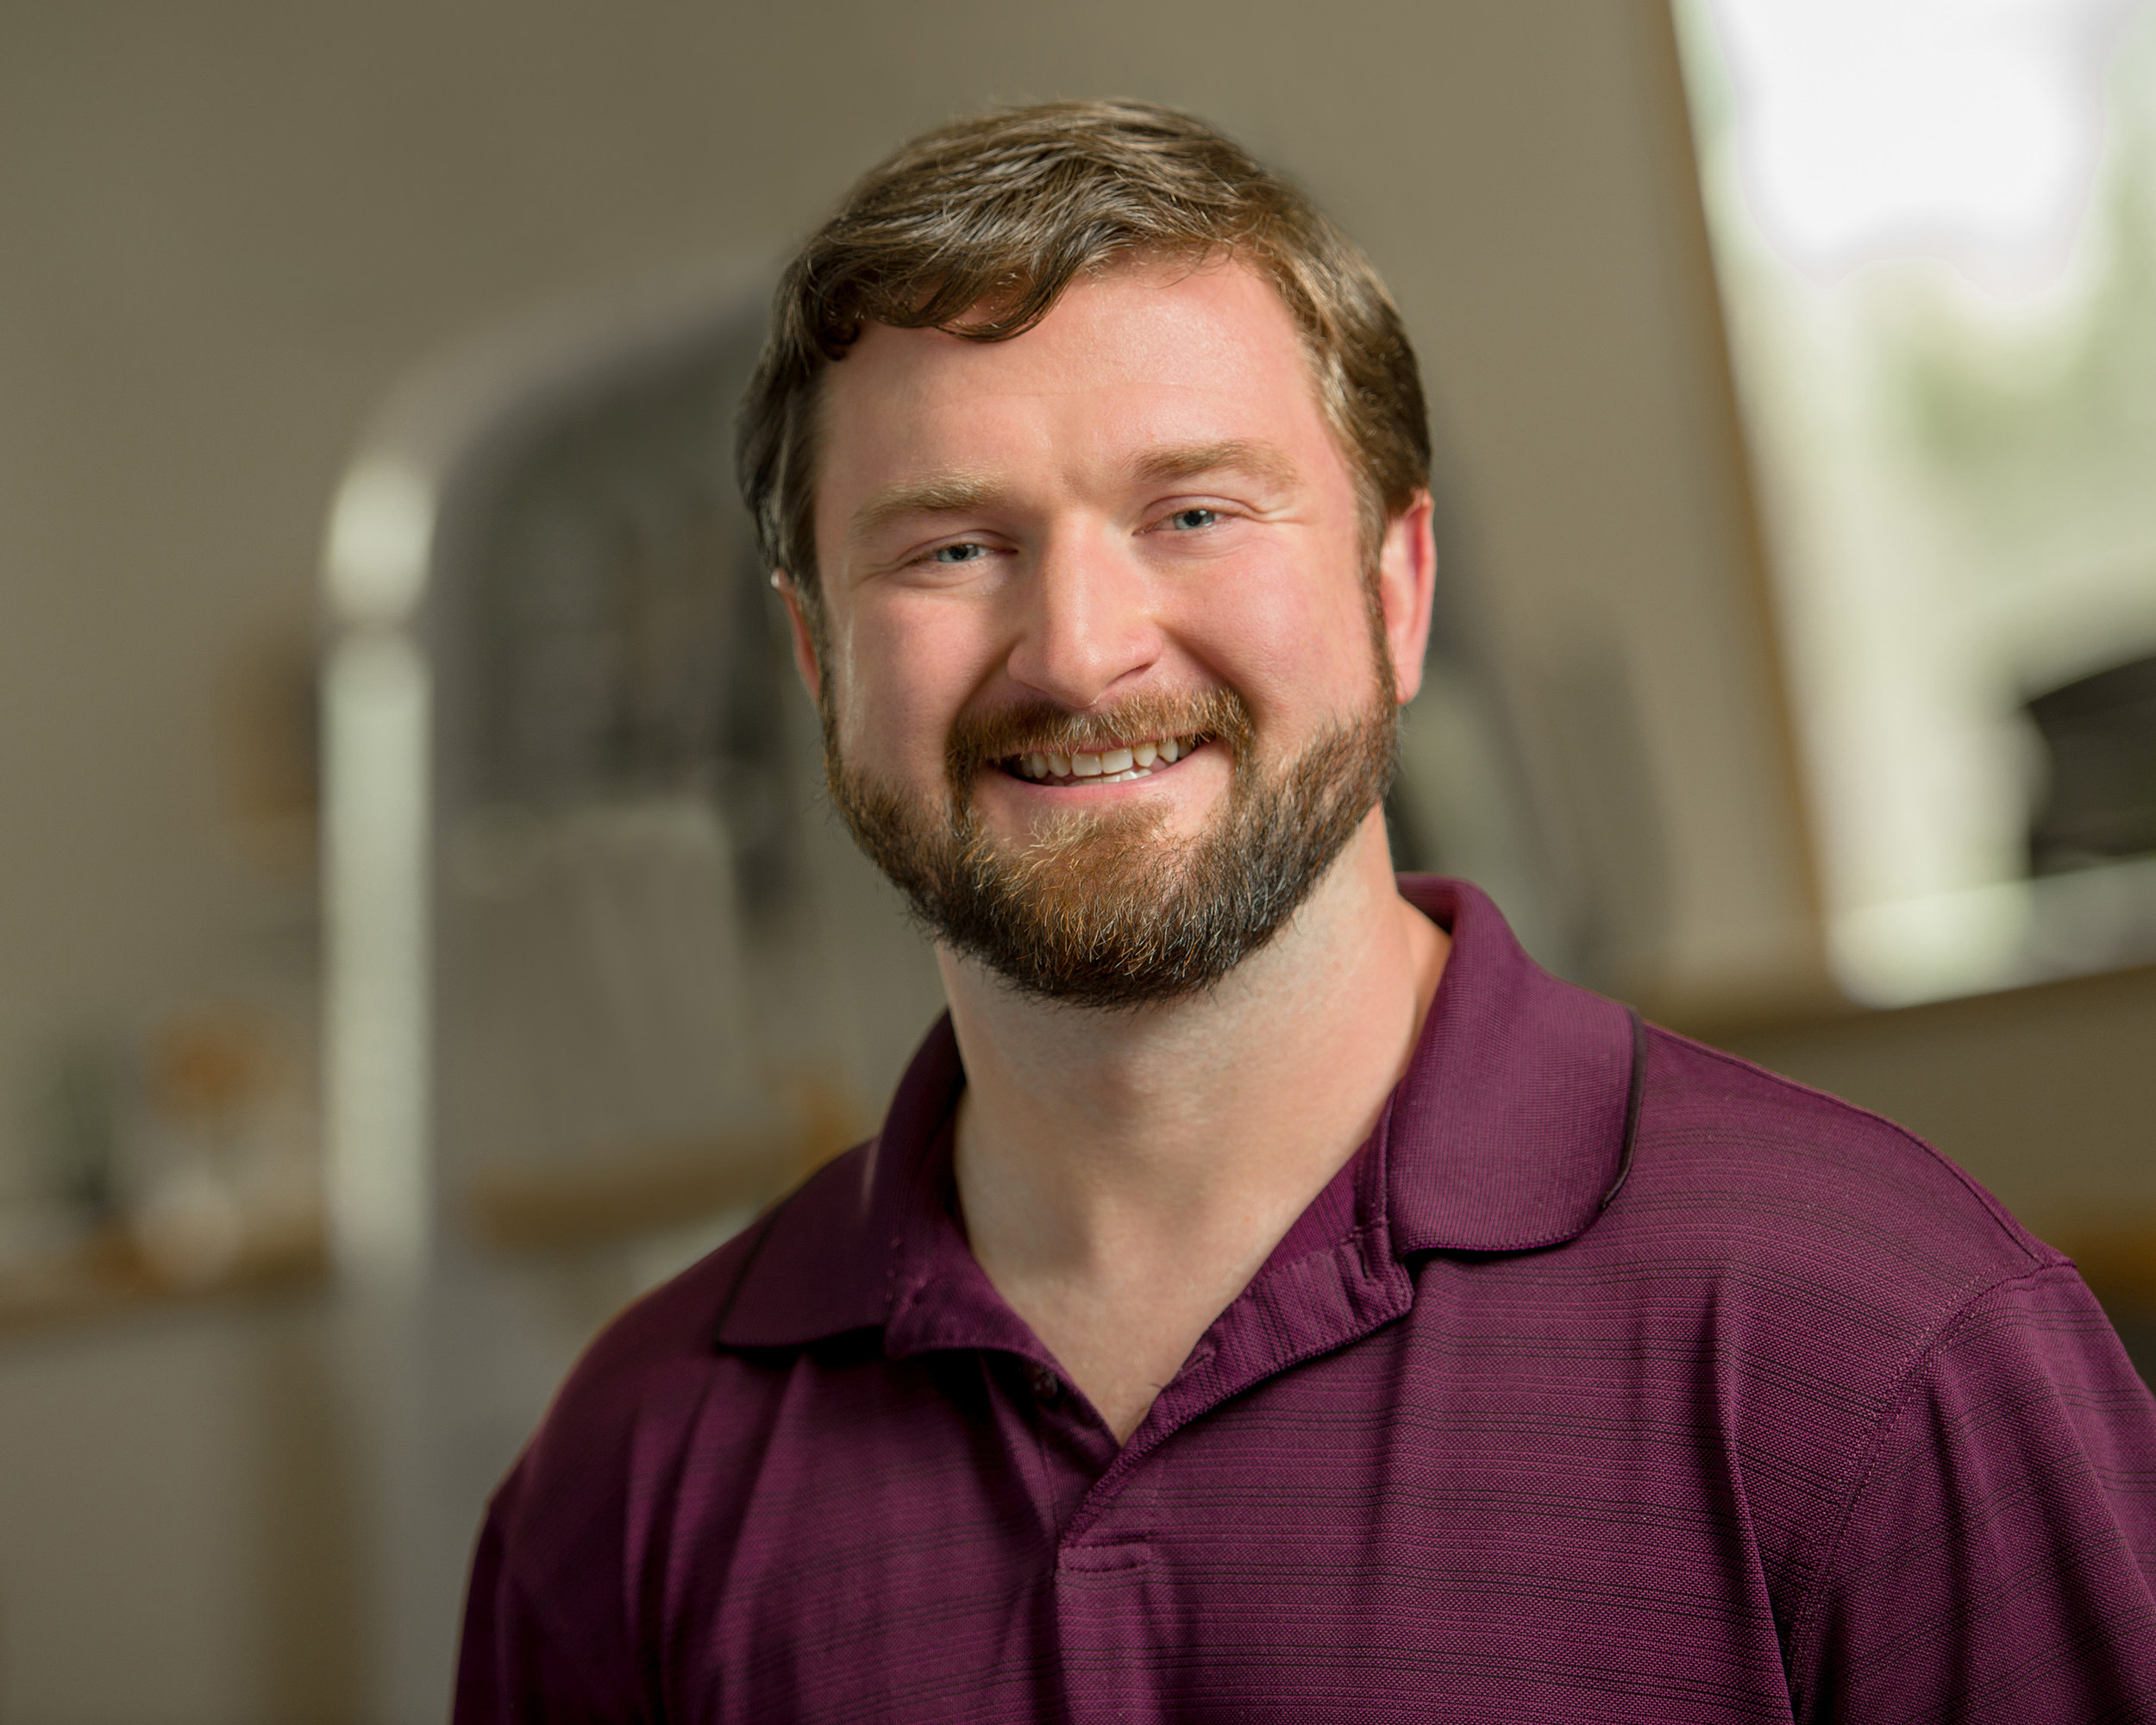 Lattimore Physical Therapist Assistant Andrew Cummings